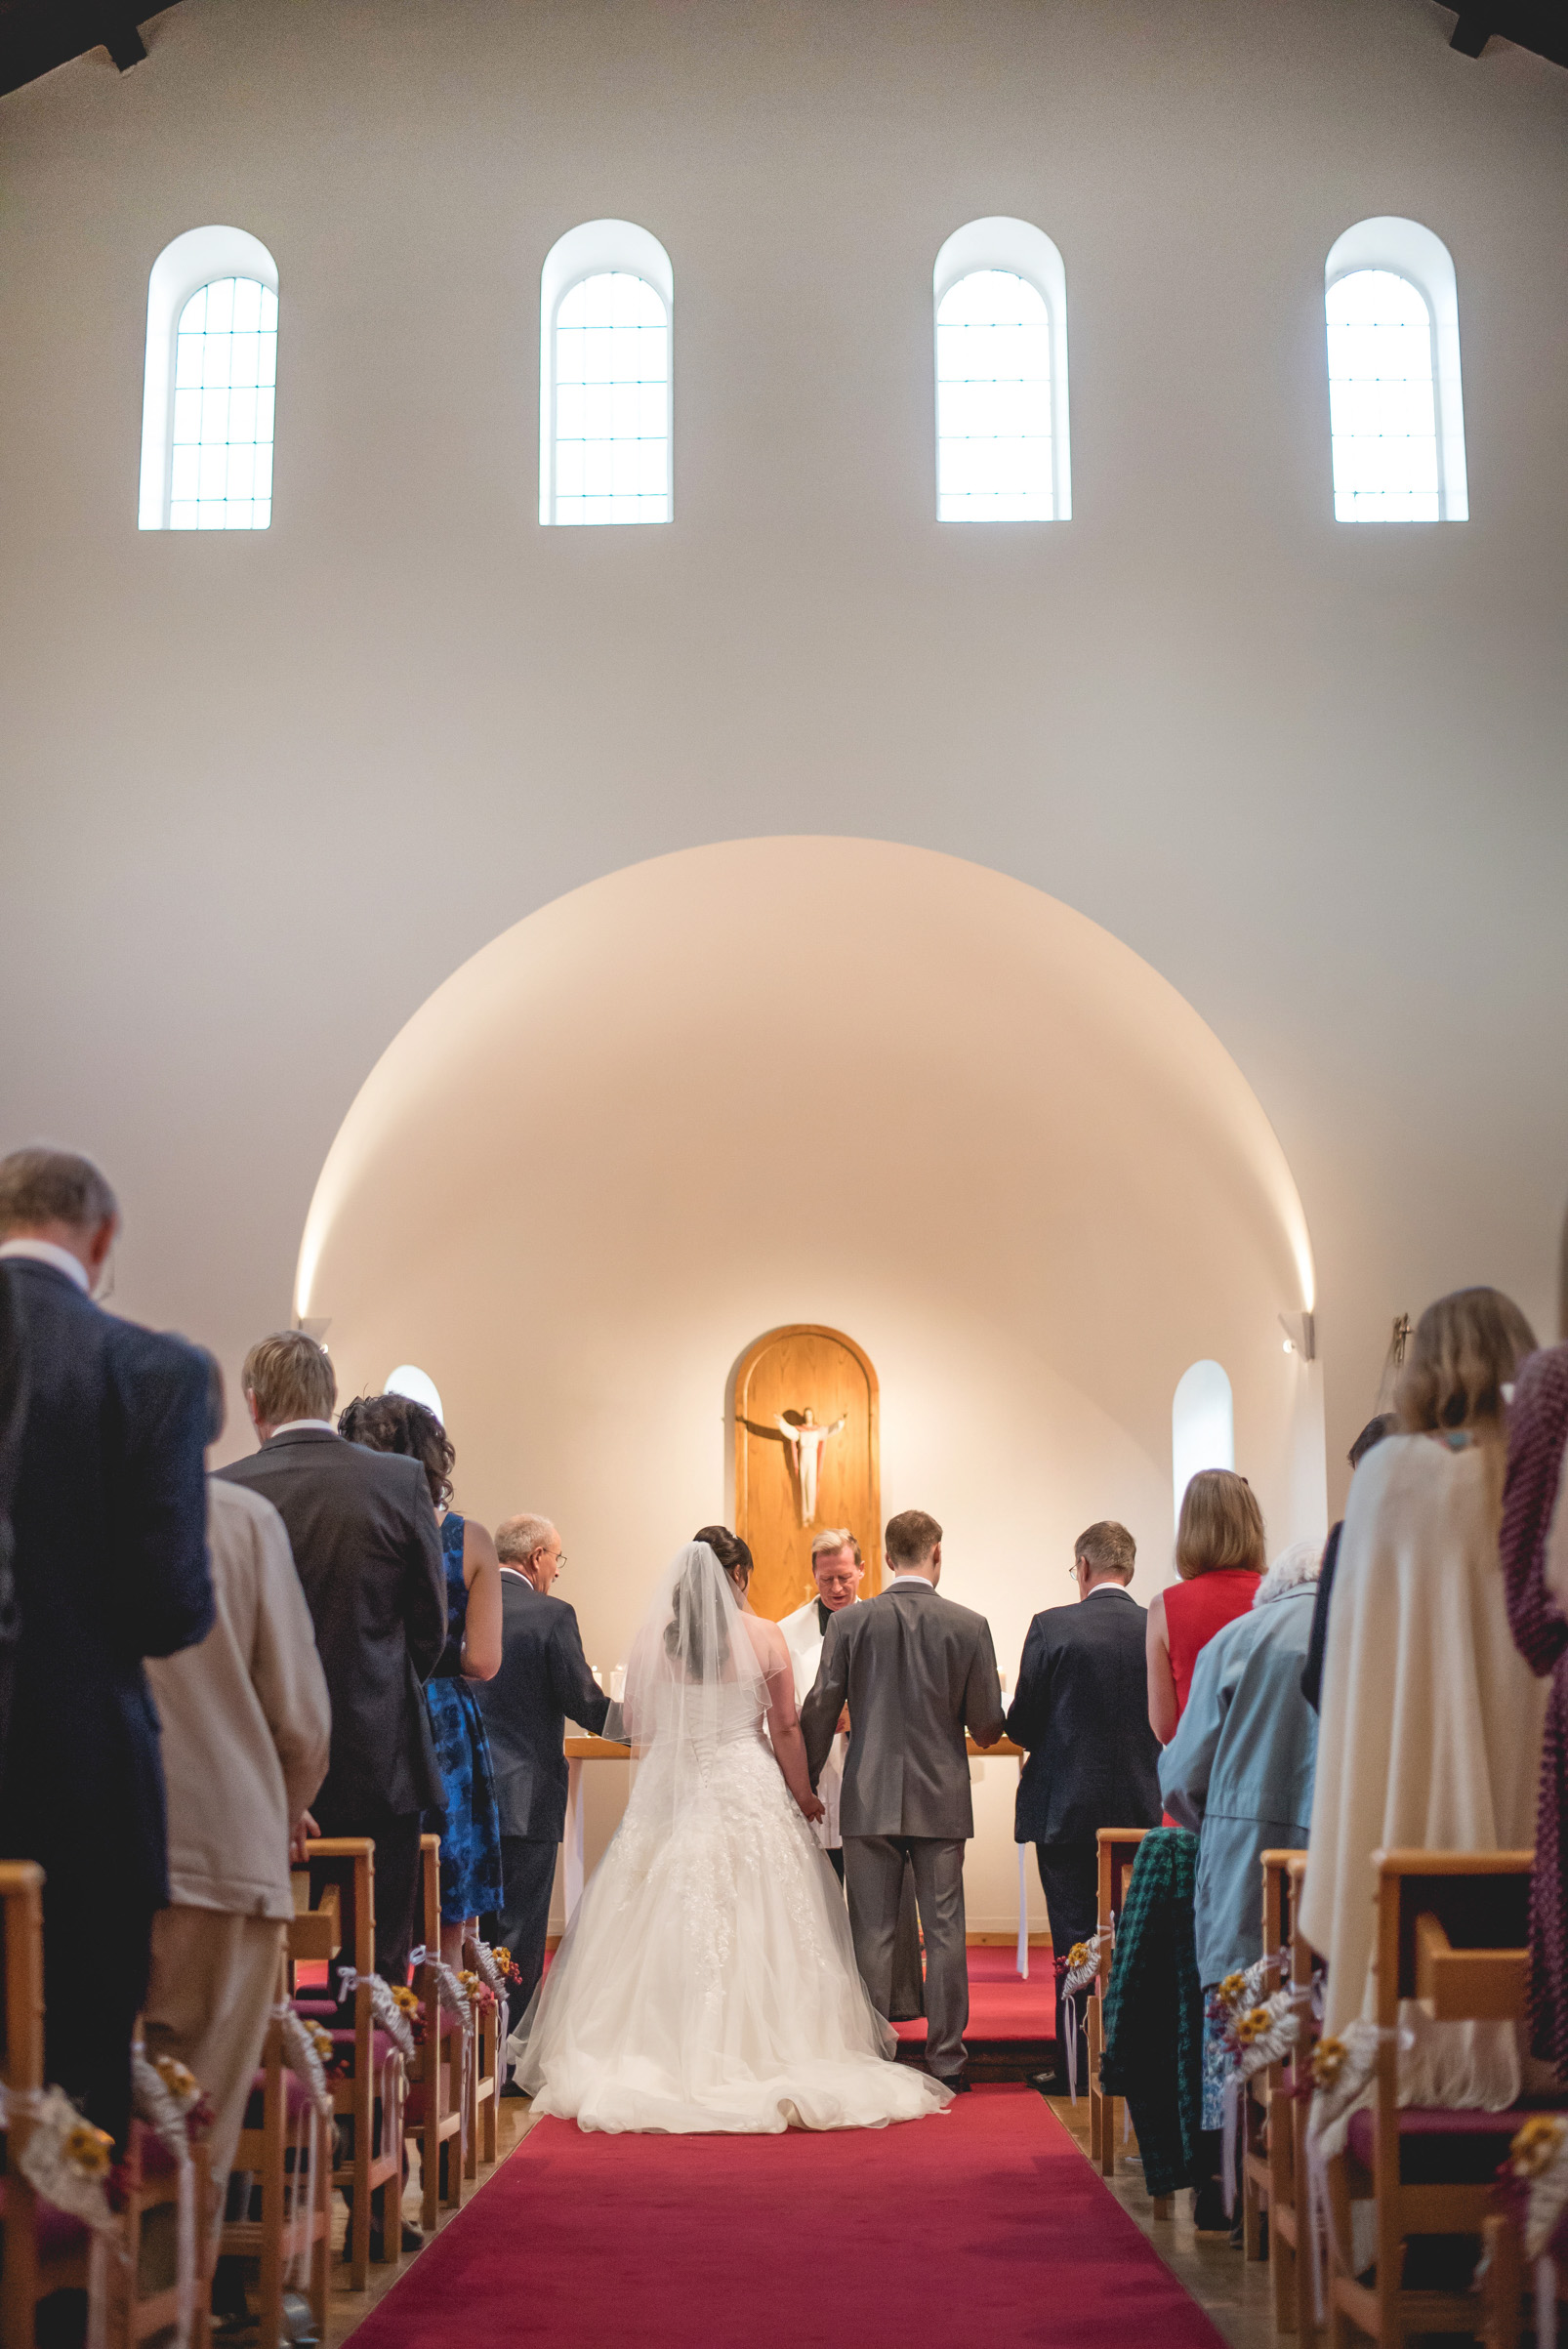 The+Fairlawns+wedding+Aldridge+StLukes+Church-83.jpg